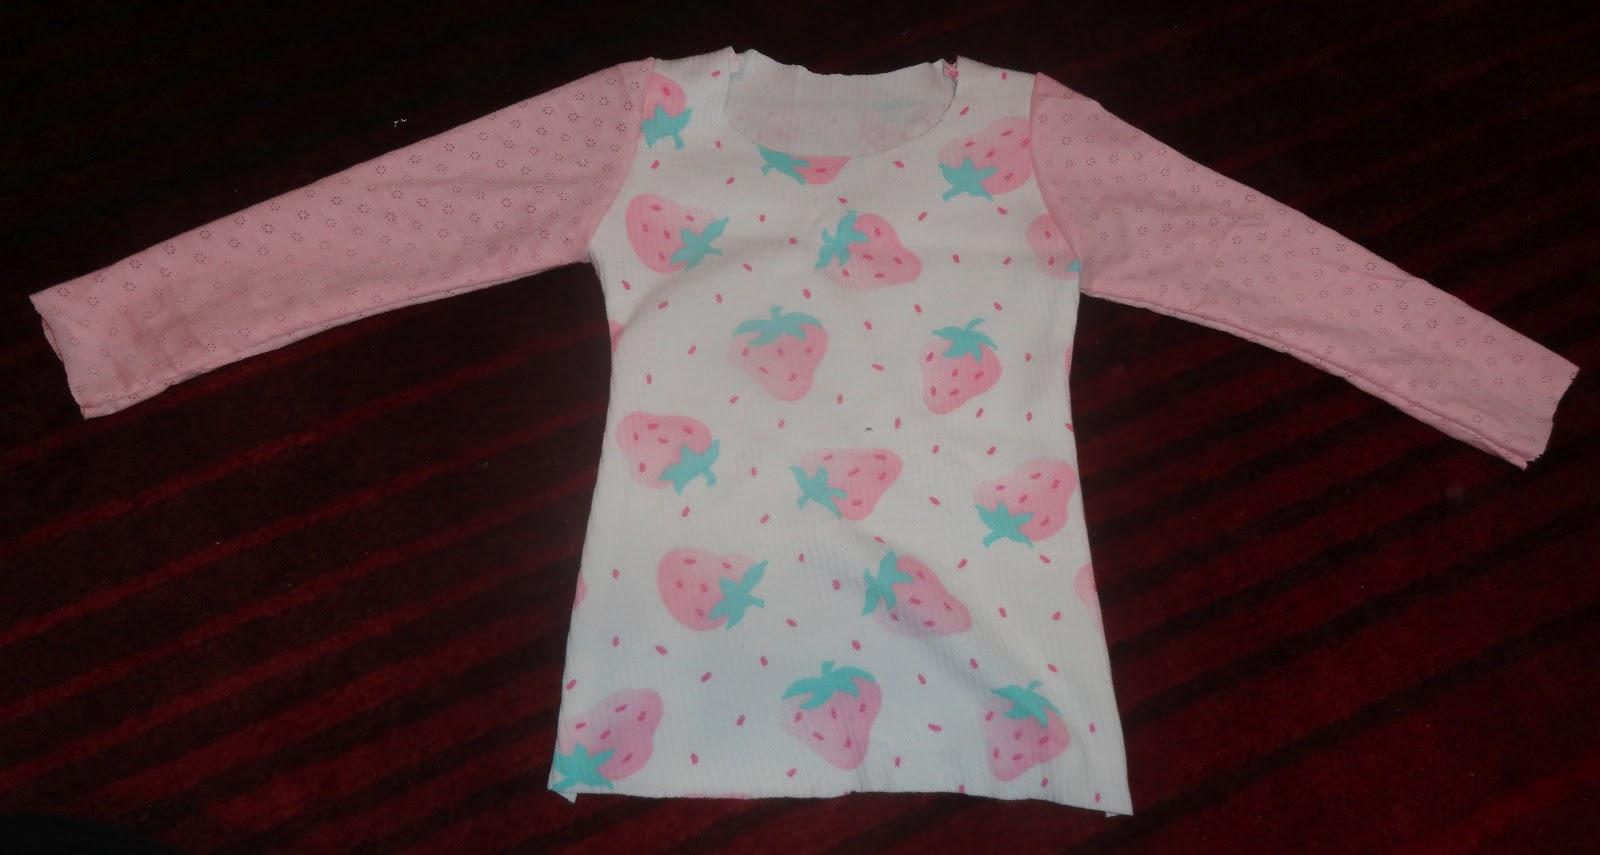 theArtisticFarmer Kid39s Pajamas Tutorial Make Your Own